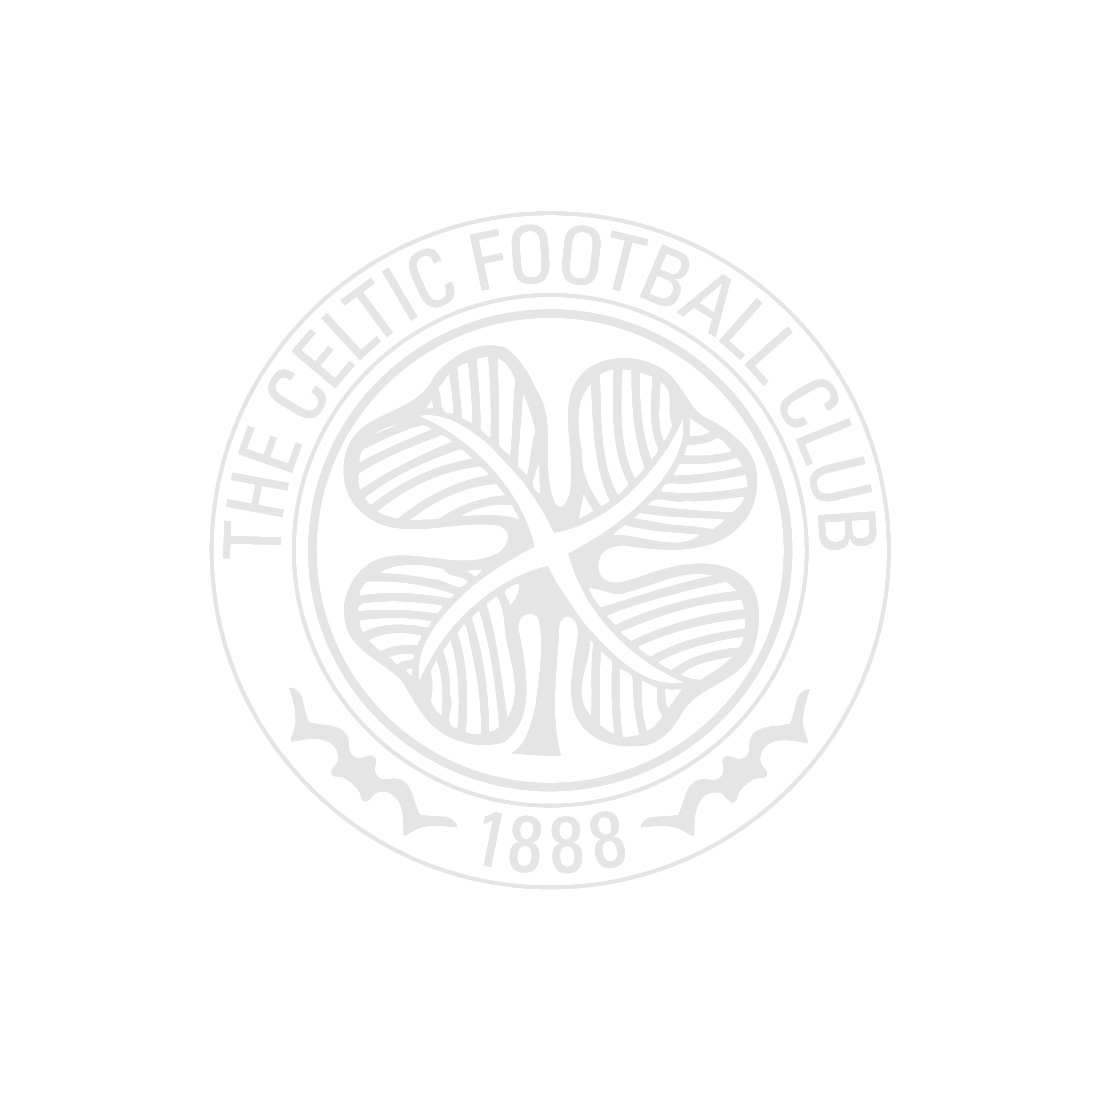 Celtic A4 holographic sticker set